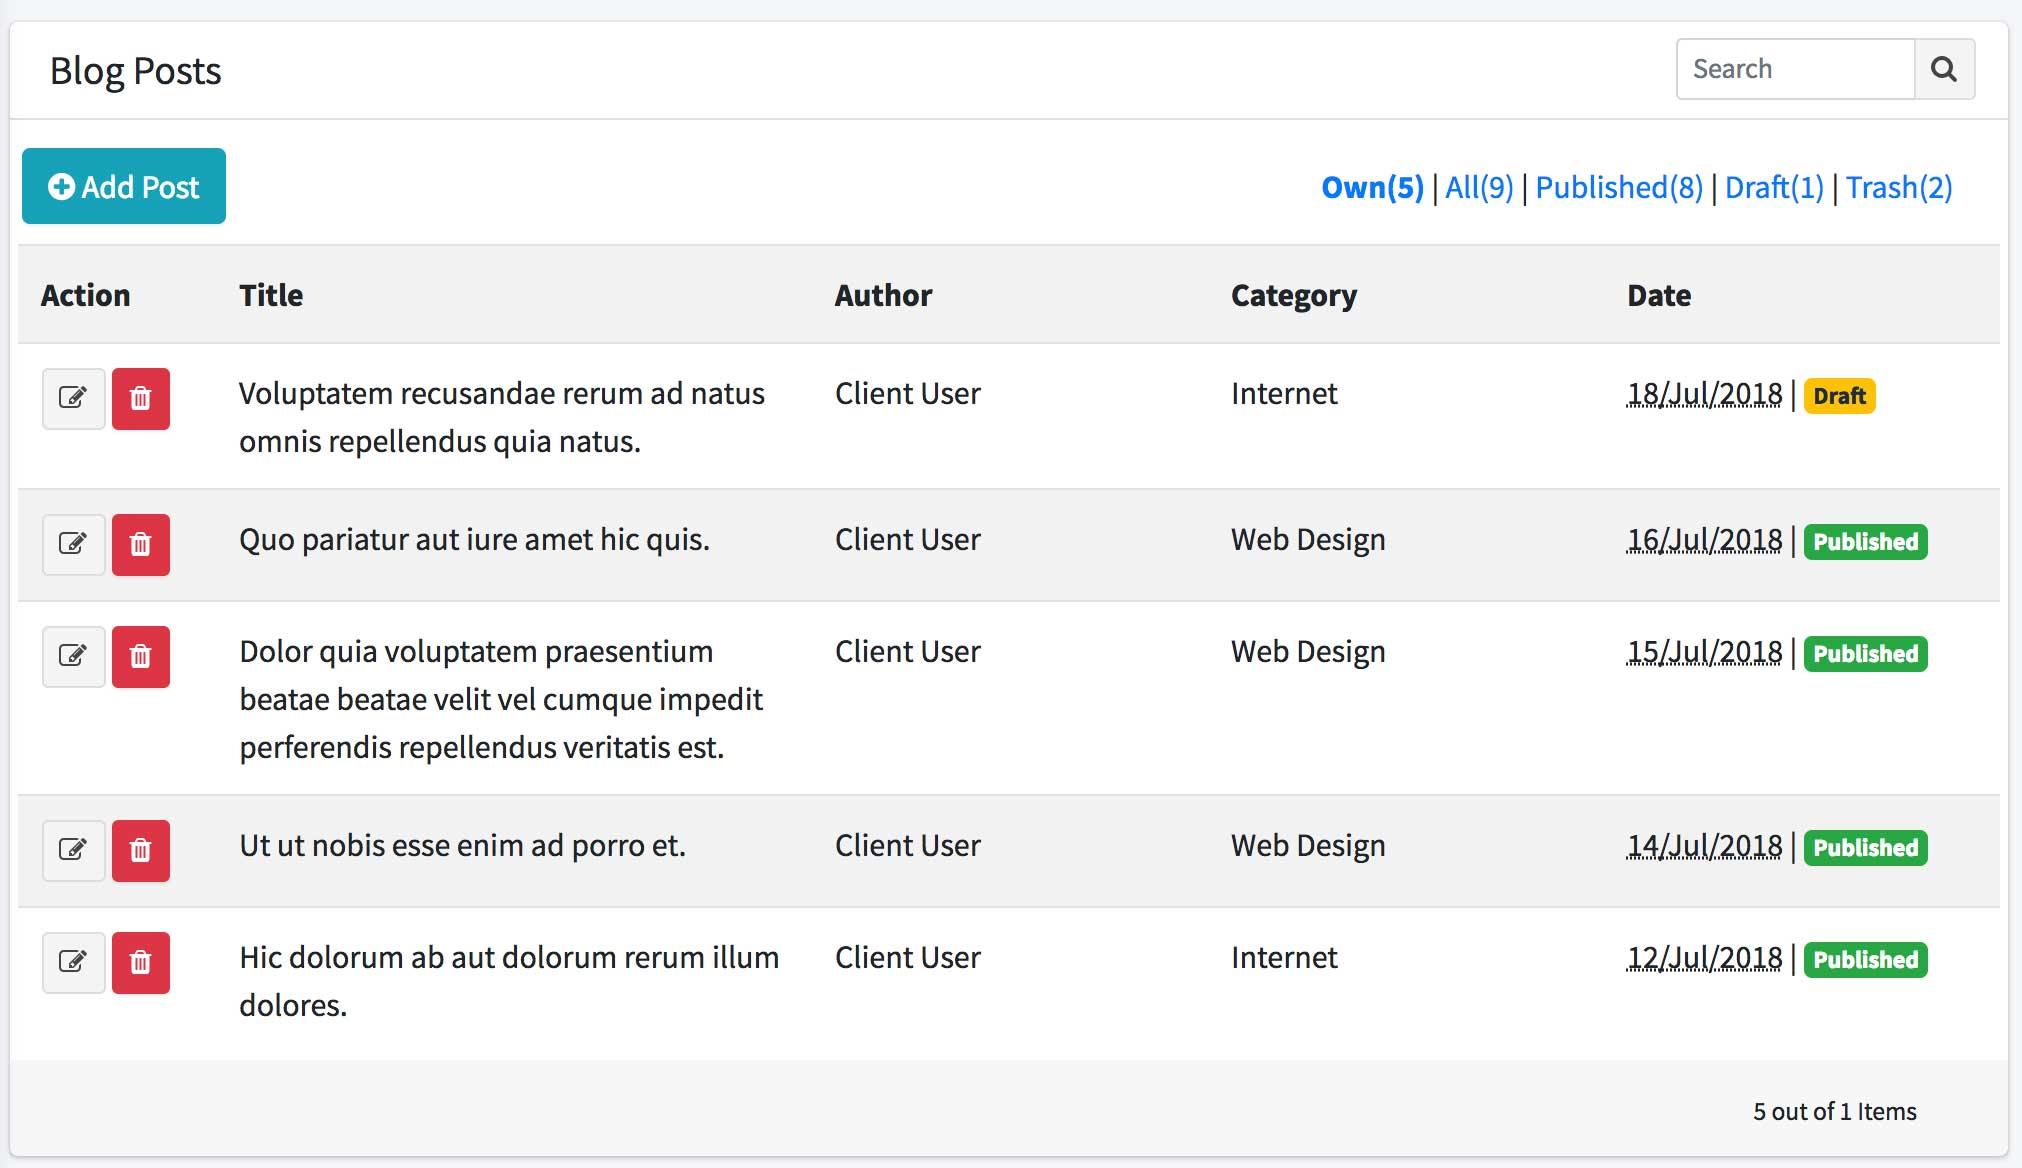 Access Control with Laratrust - WordPress-Like Blog Laravel 5.7 and AdminLTE 3 (17-2) 3